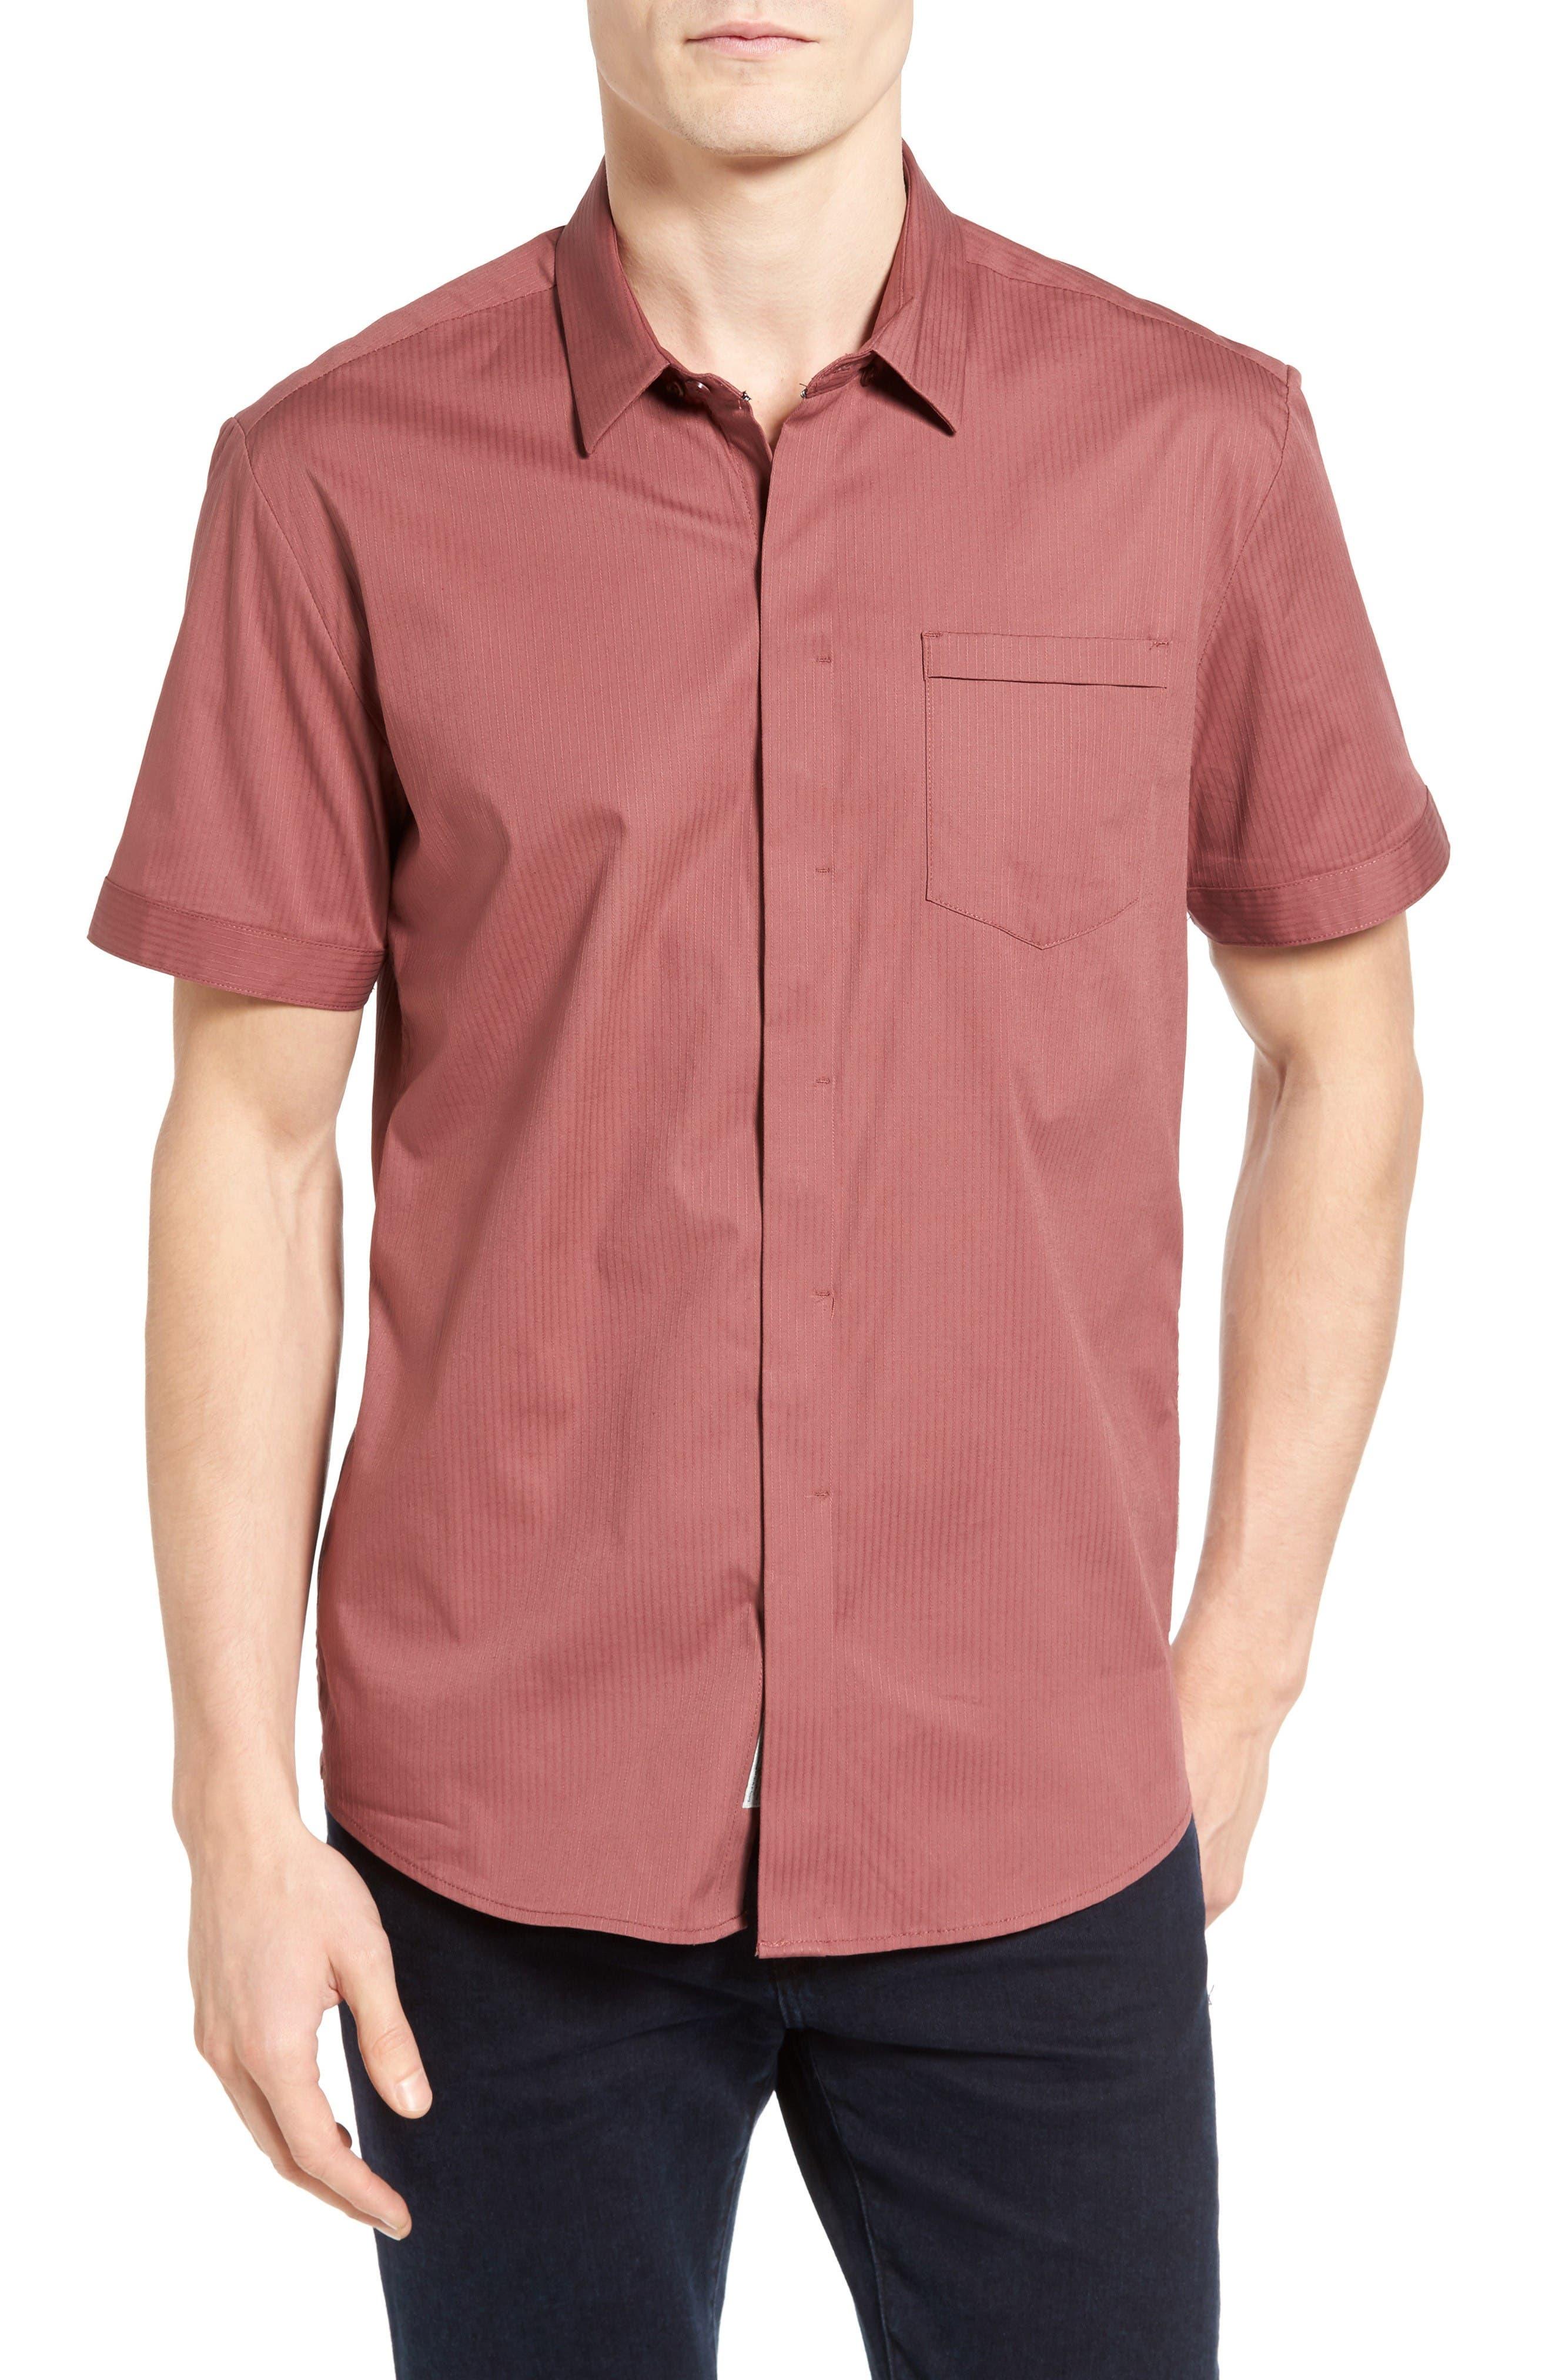 City Savior Woven Shirt,                         Main,                         color, Roan Rogue